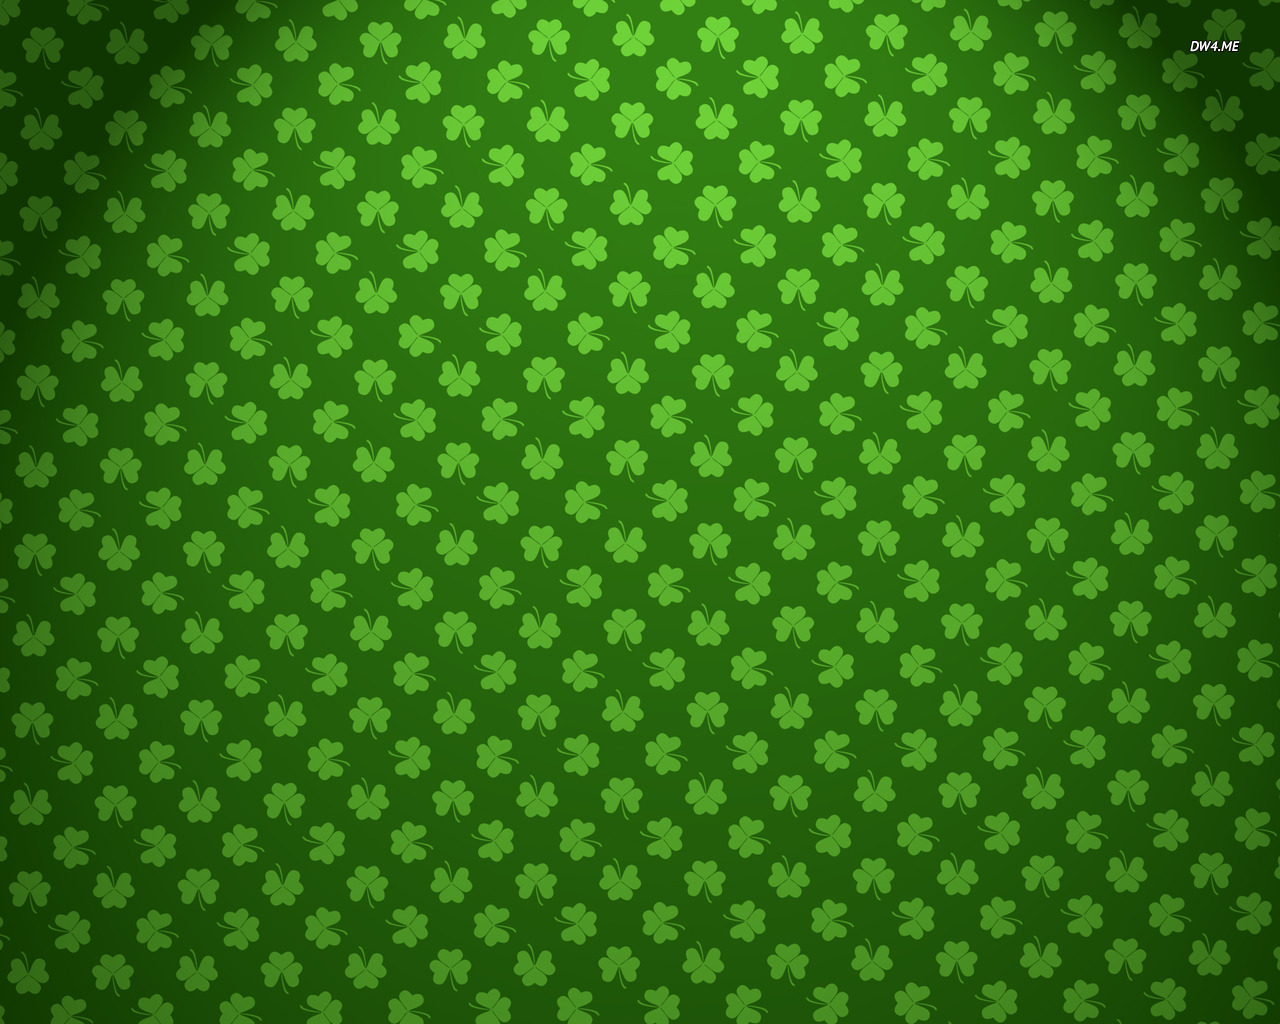 Shamrock pattern wallpaper - Digital Art wallpapers - #1204